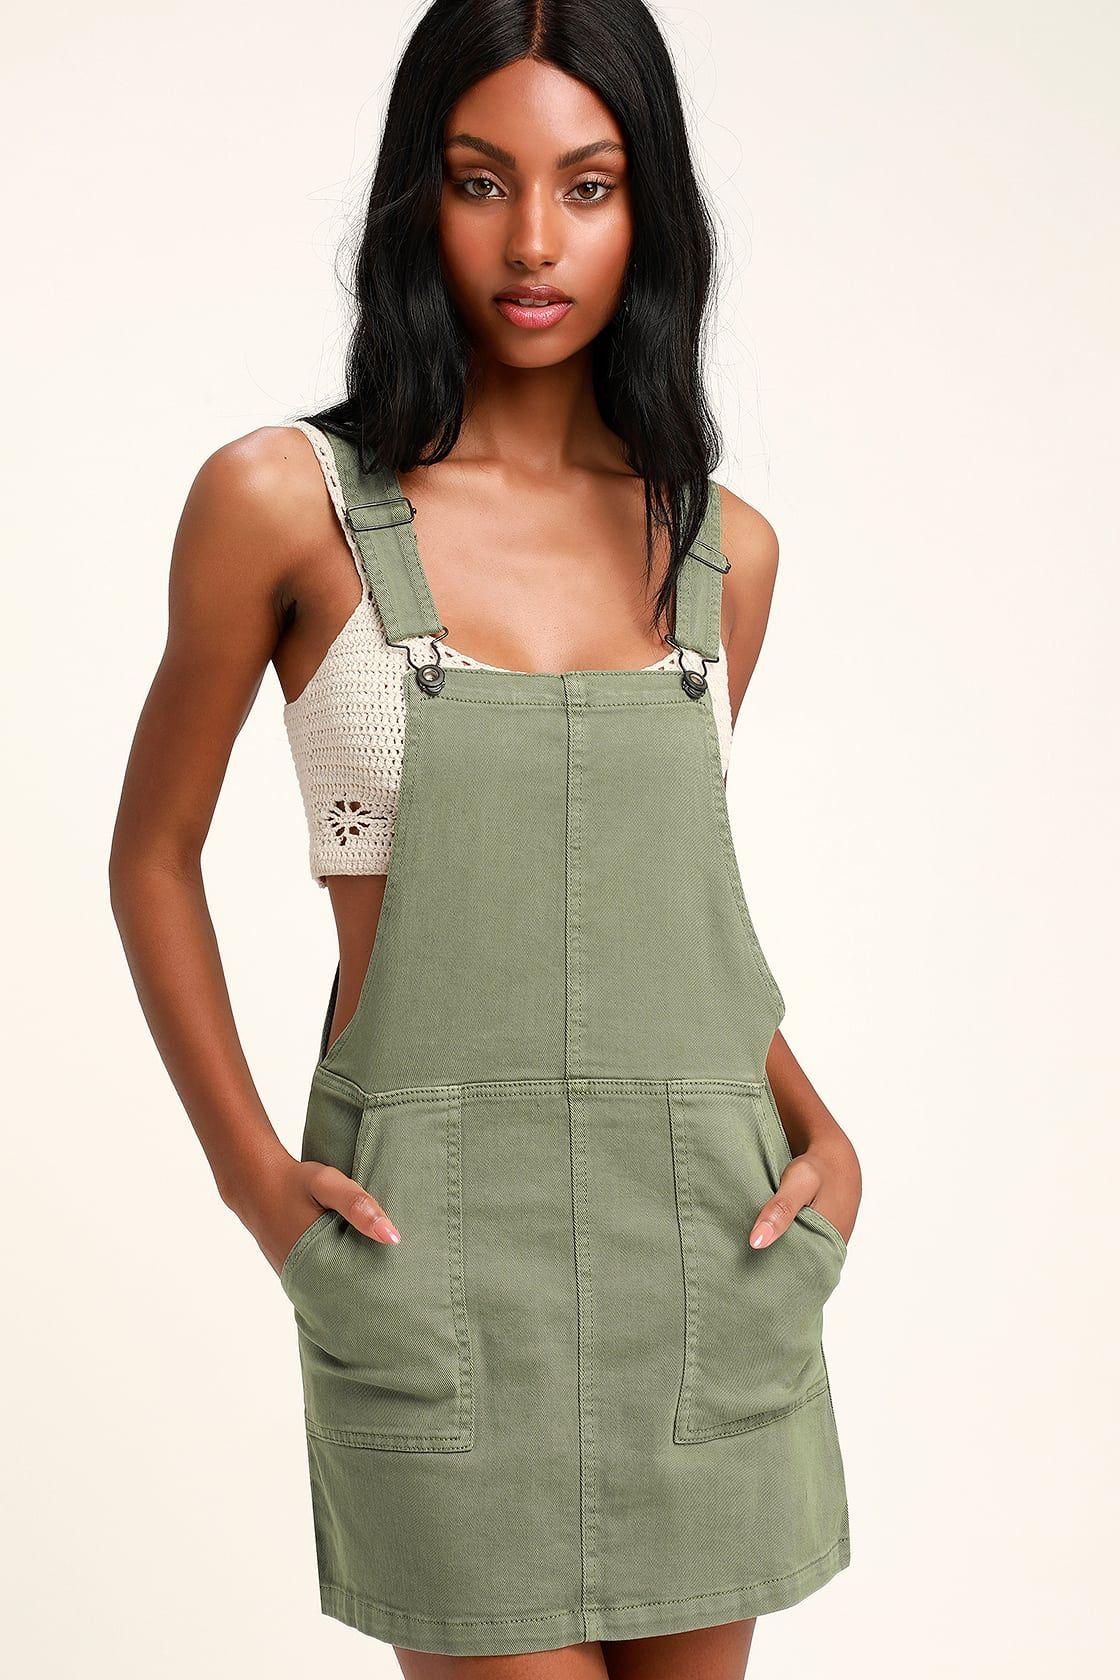 Abigail sage green denim overall dress denim overall